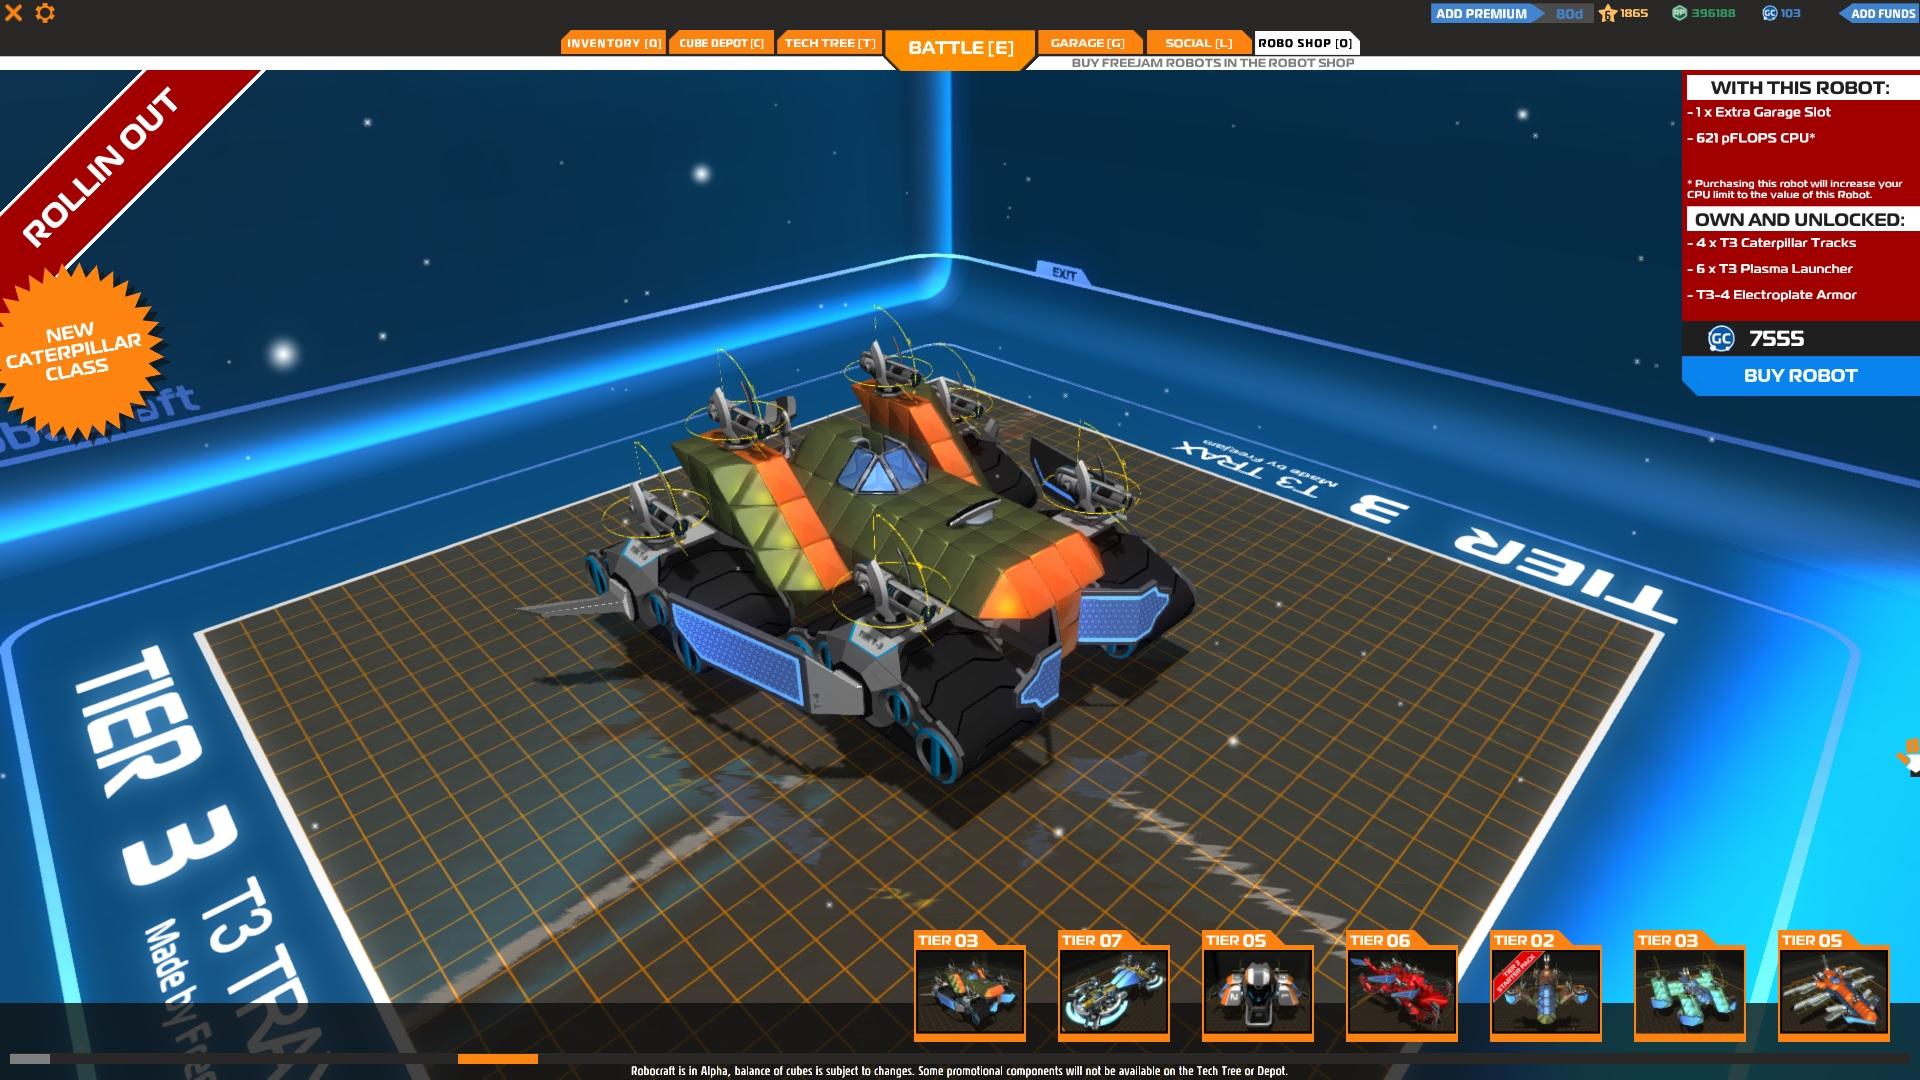 Communauté Steam :: Guide :: Roboshop Robot's - How to ...